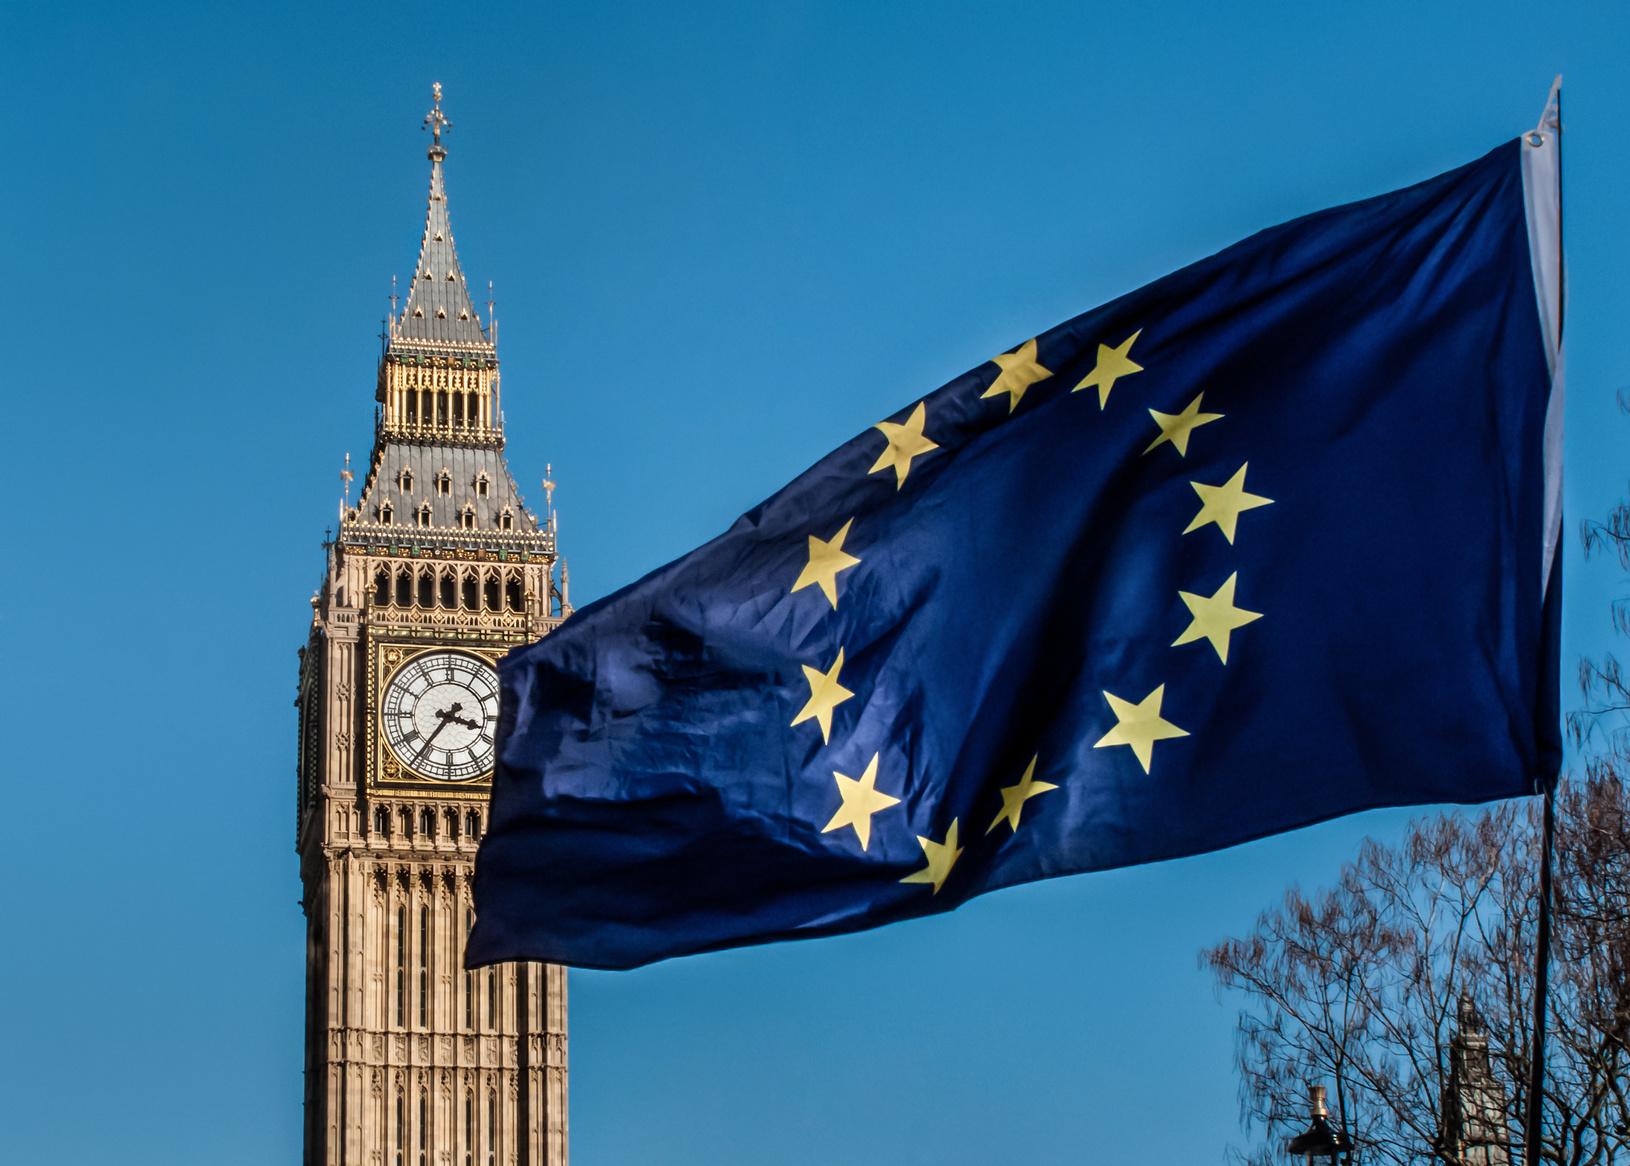 European Union flag in front of Big Ben, Brexit EU